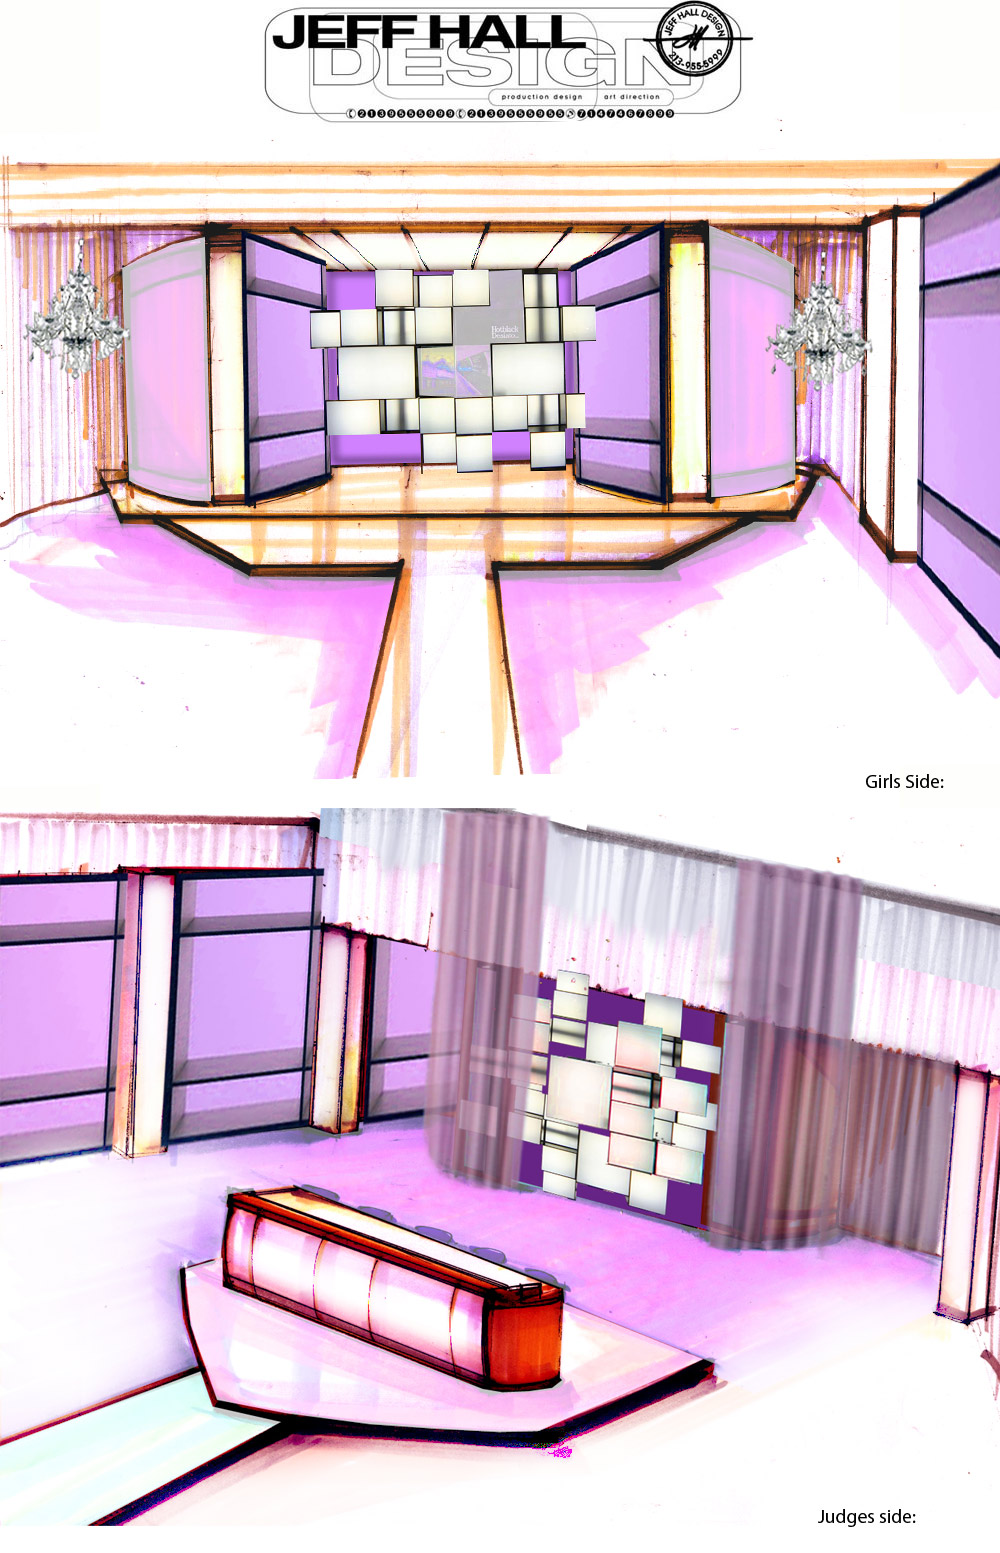 ANTM12_Stage_JeffHall_Sketch